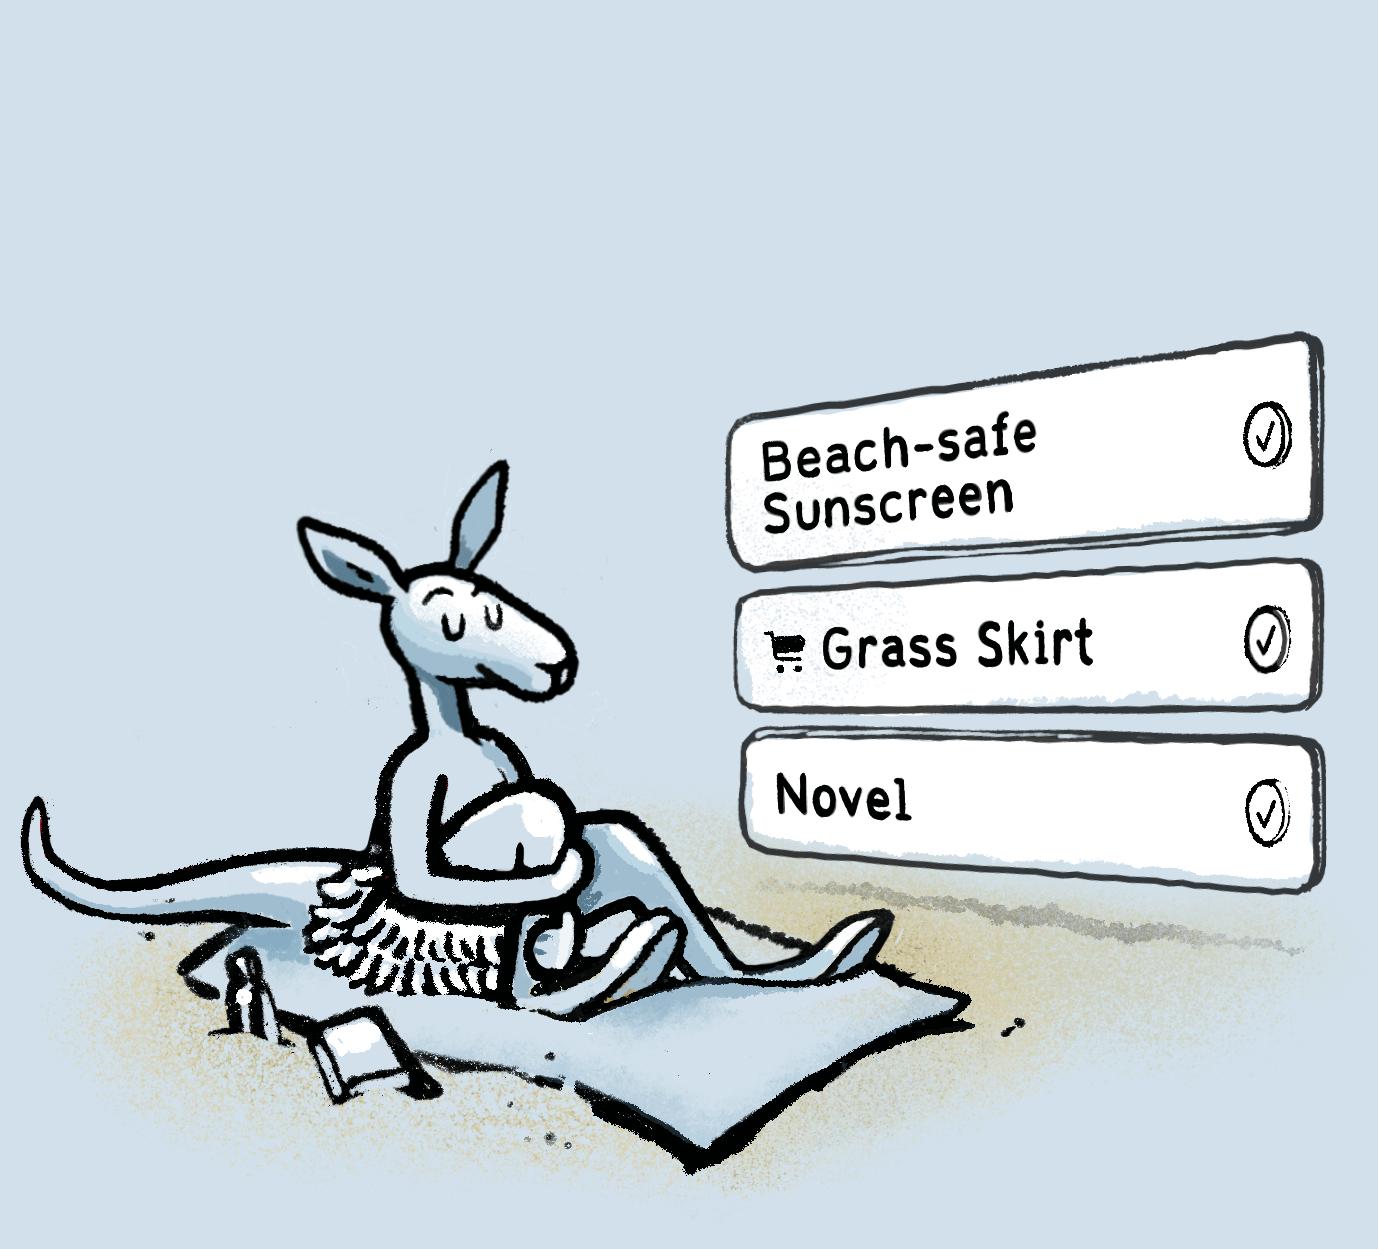 A Kangaroo on a beach blanket looking smug.